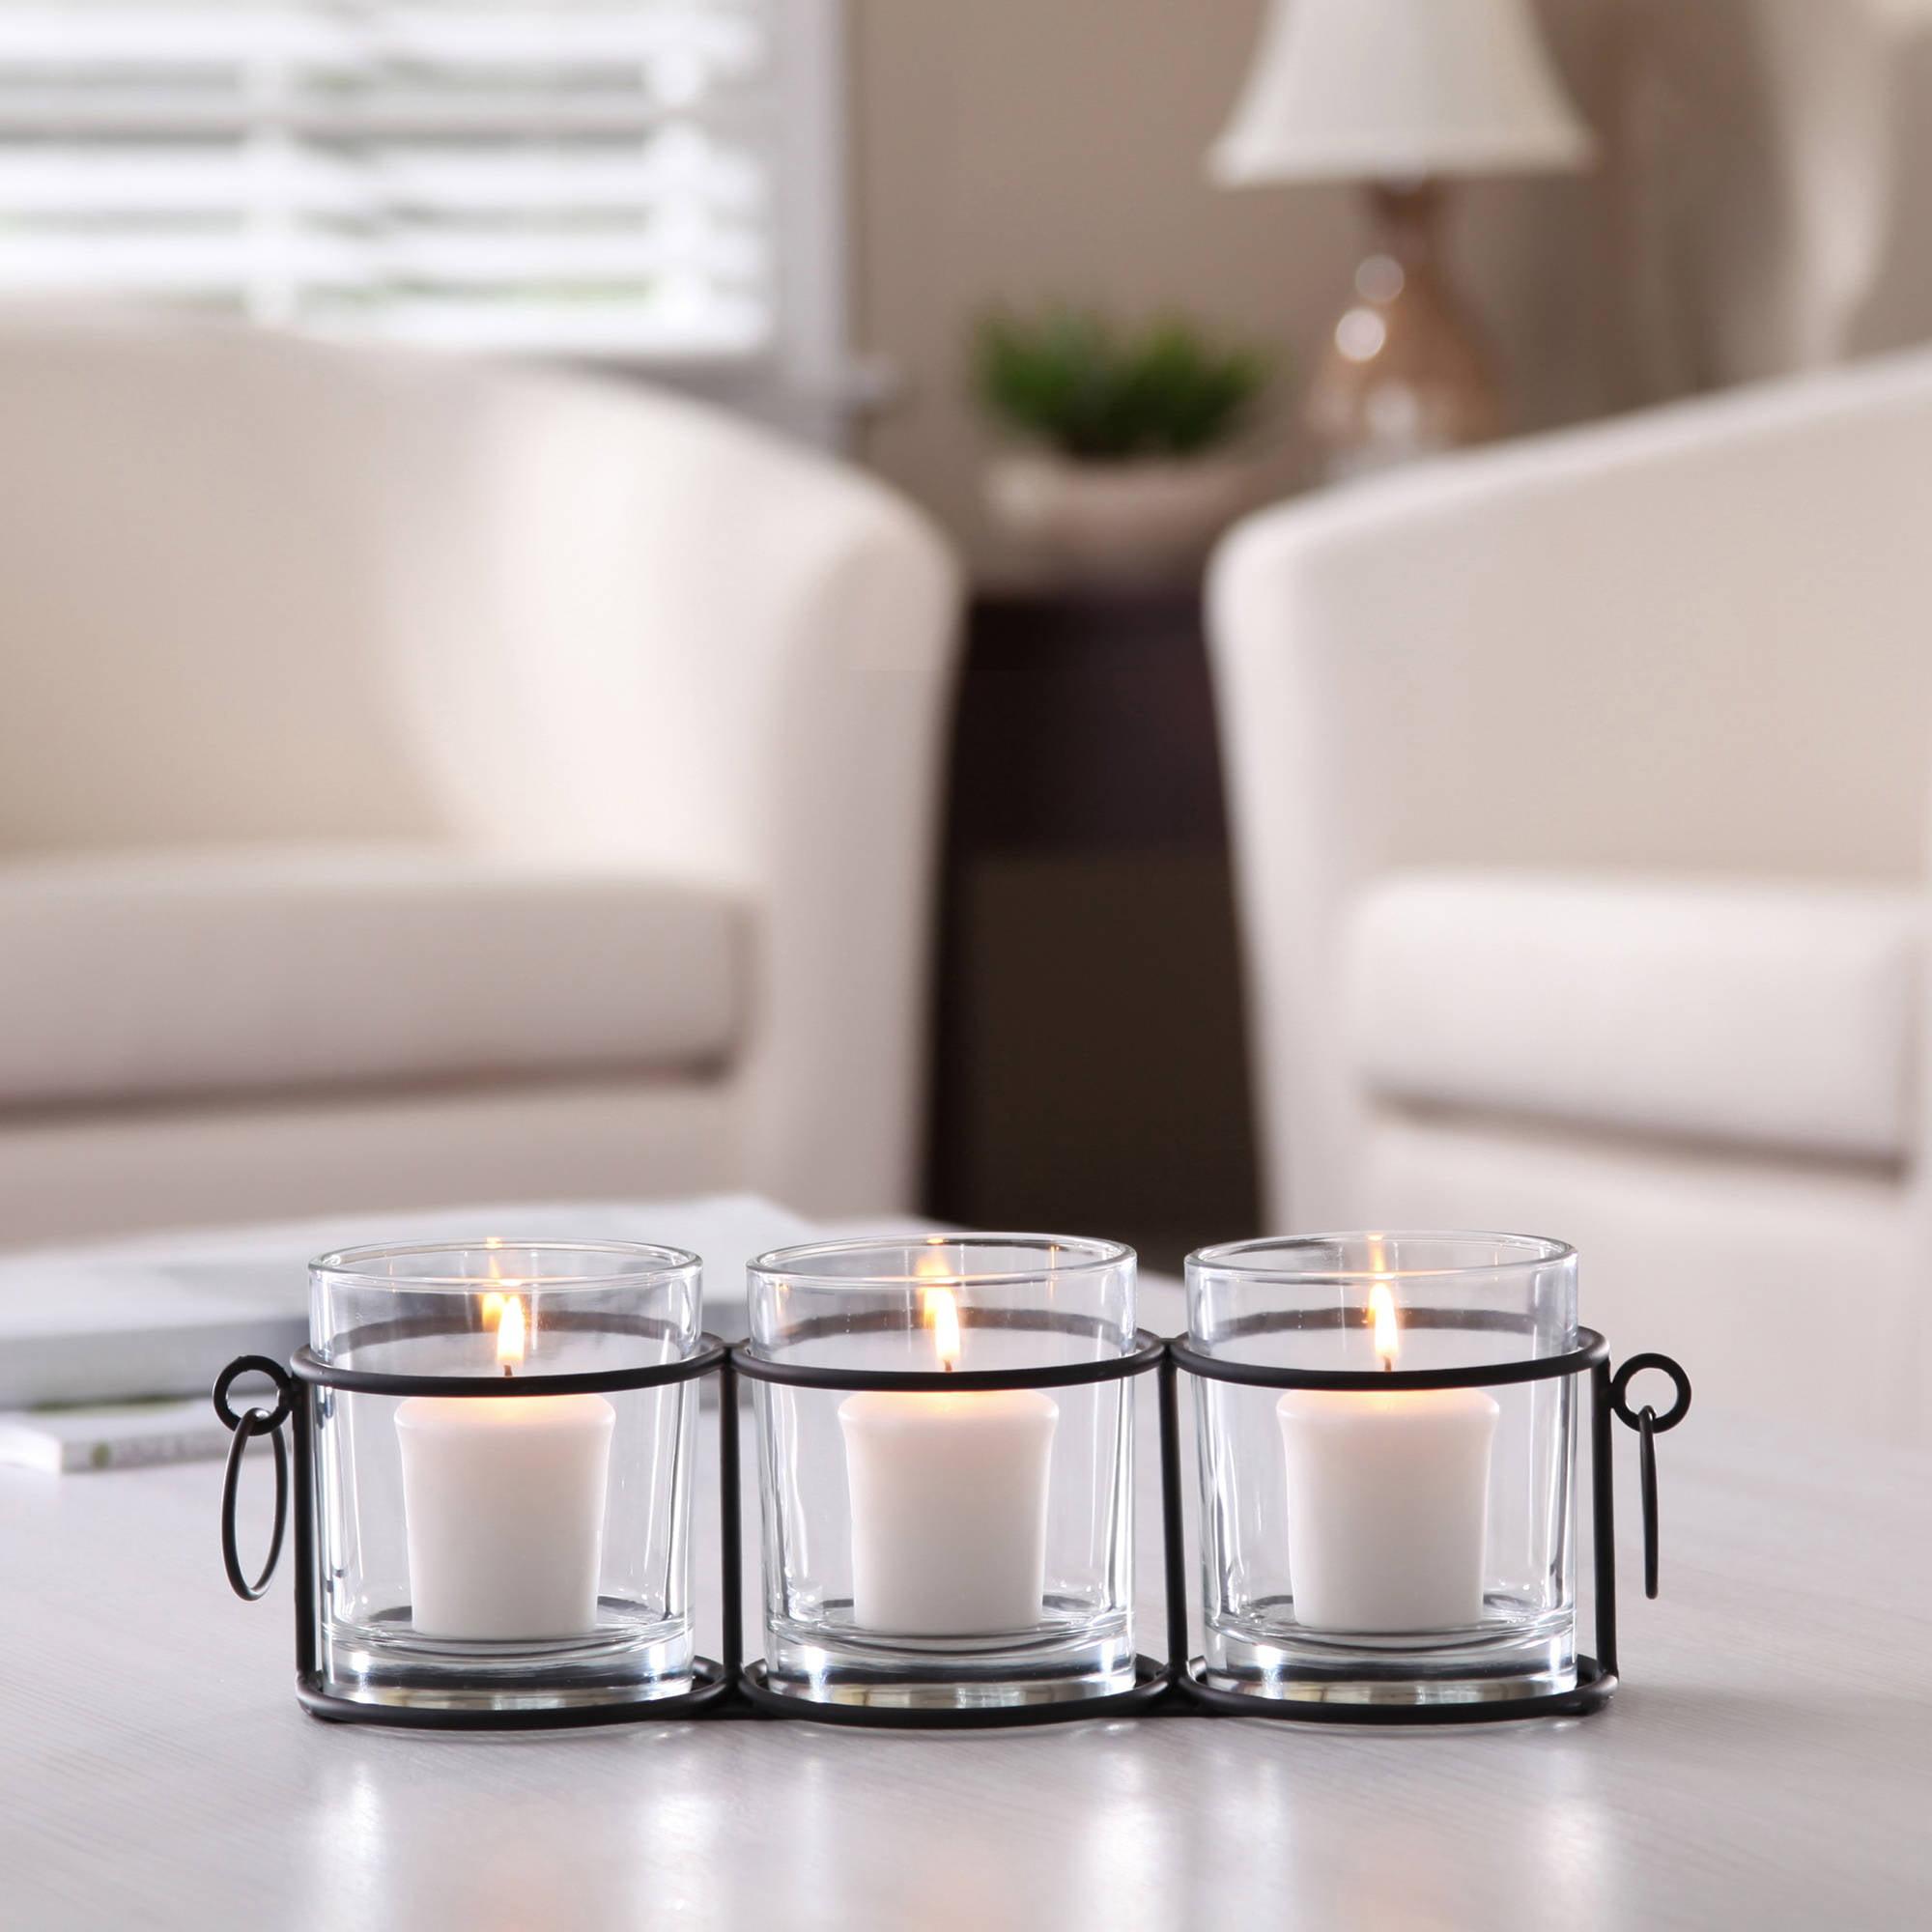 Better Homes and Gardens 3 Votive Jar Rail Candle Holder, Black